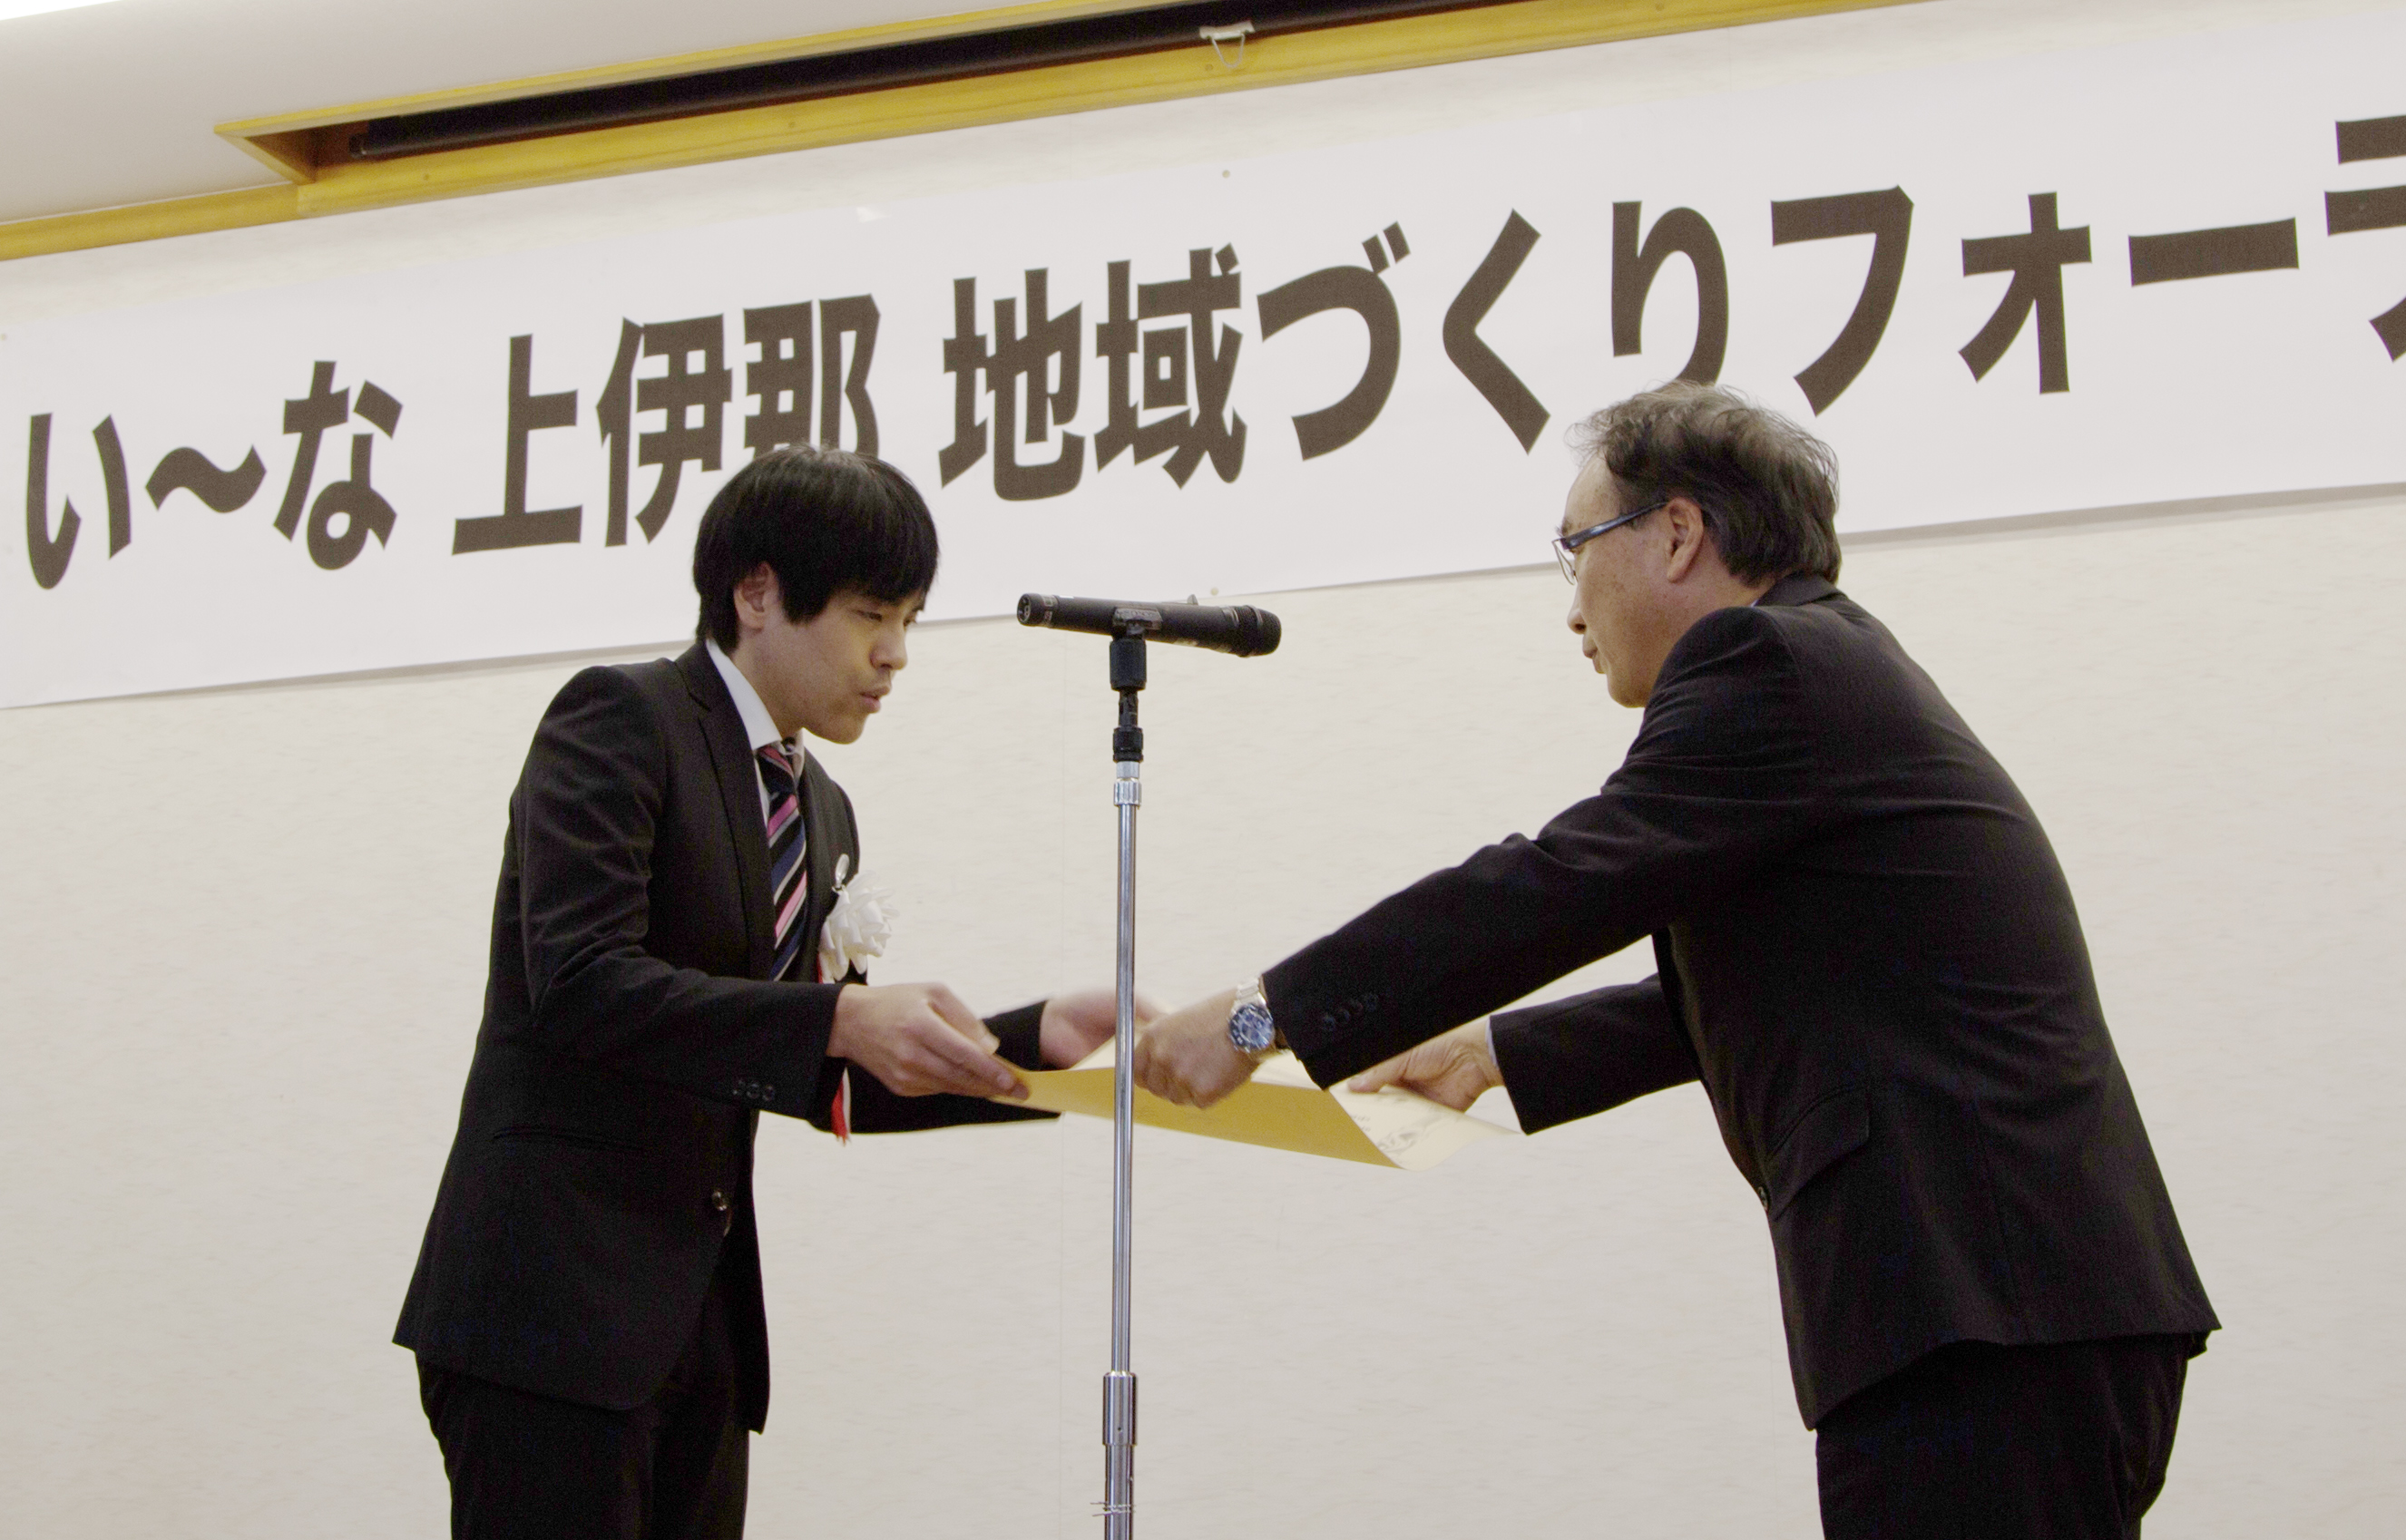 2017年10月28日長野県地域発元気づくり支援金優良事例表彰式